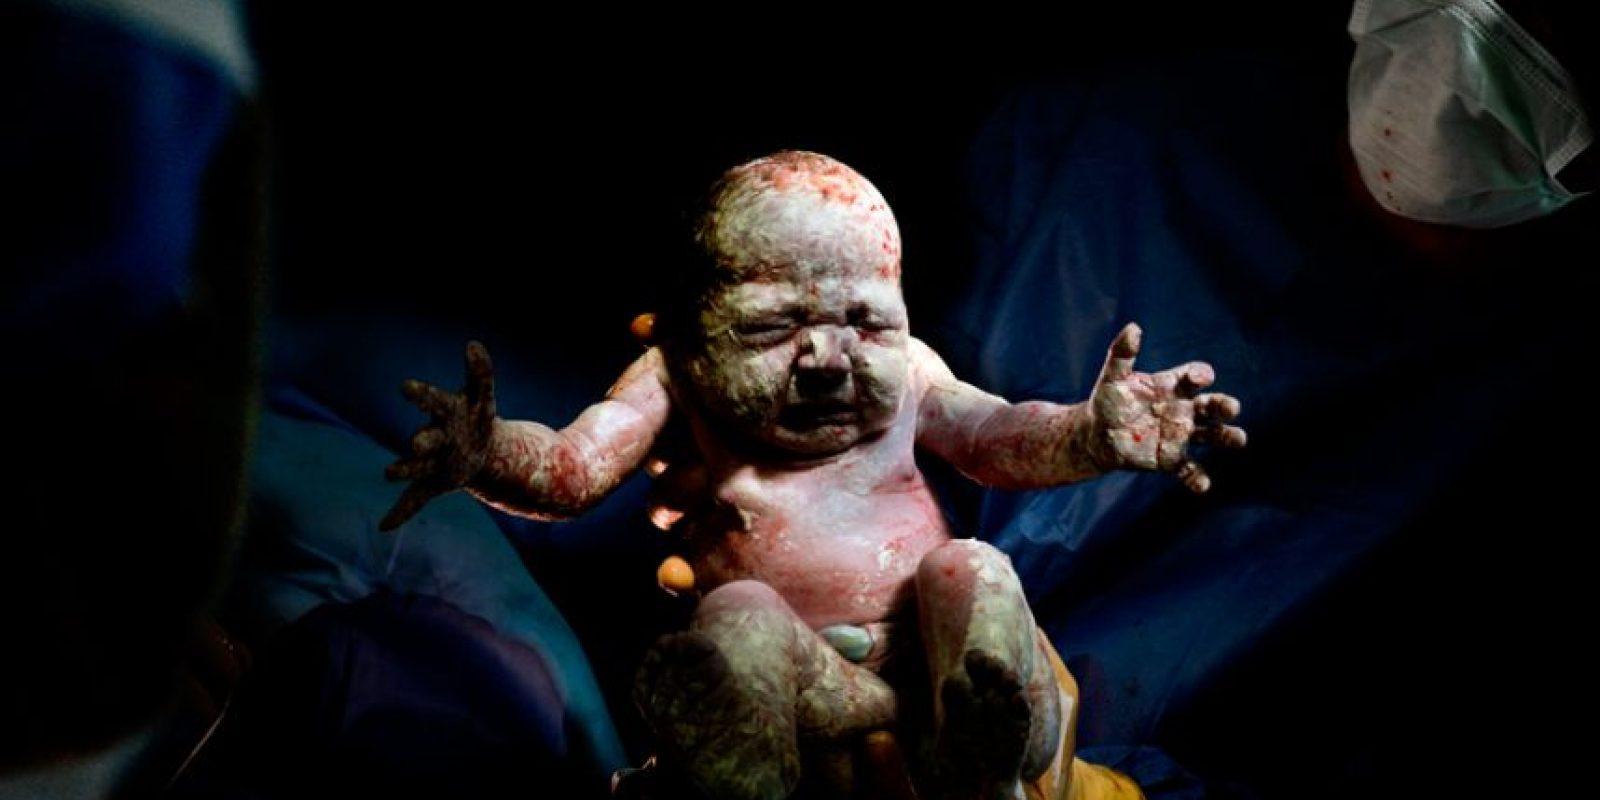 Nacido mayo 20, 2014 a las 10:51 2kg 935 – 8 segundos de vida Foto:Christian Berthelot